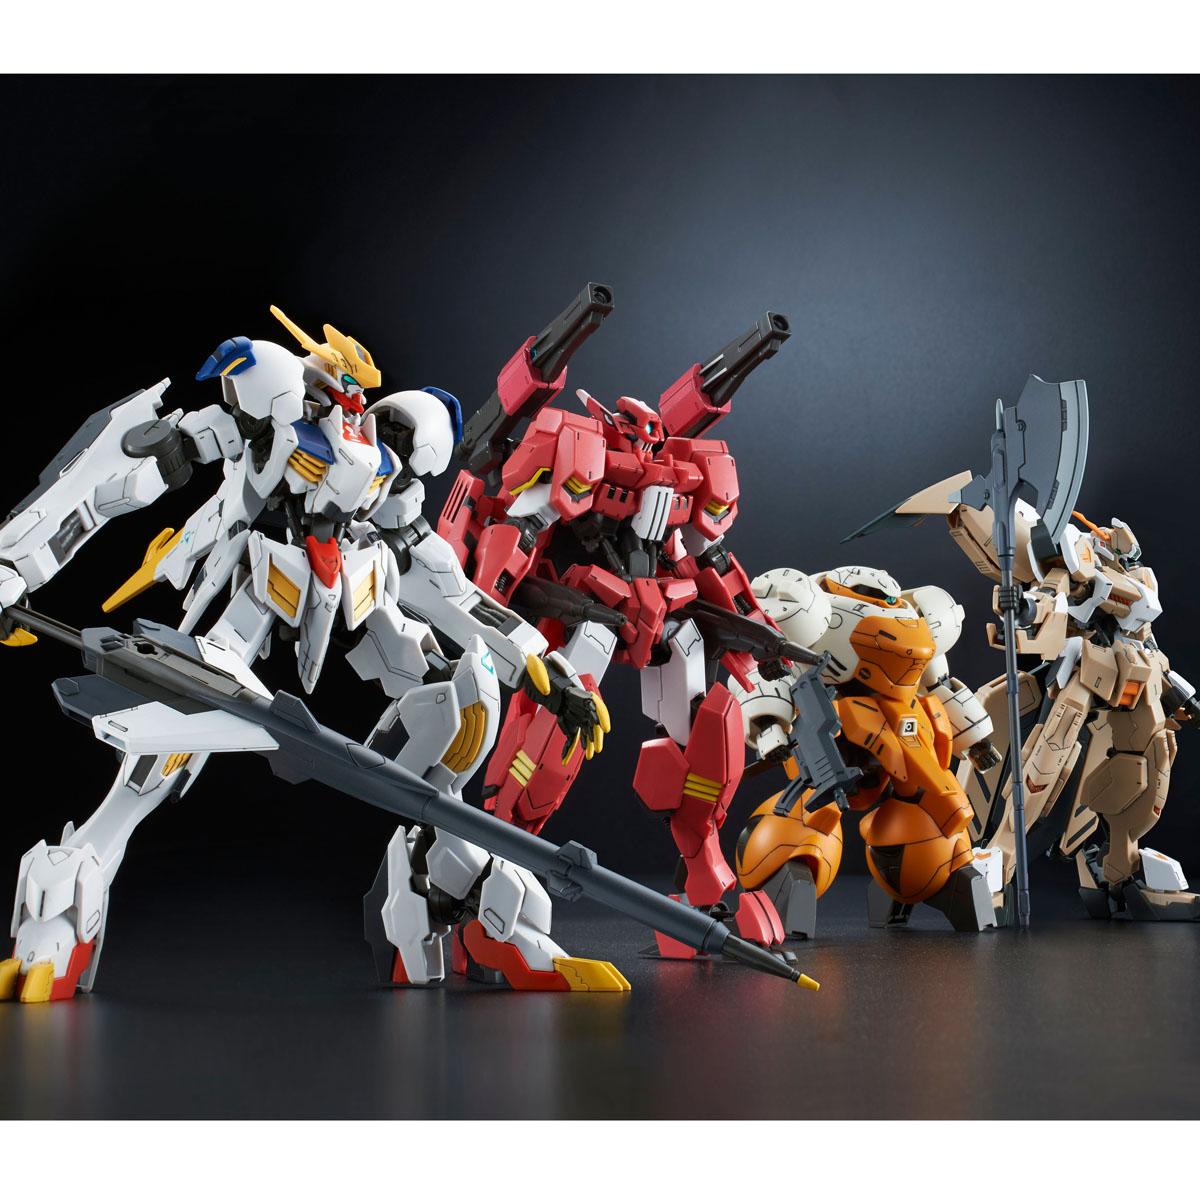 HG 1/144 鉄華団コンプリートセット [Tekkadan Complete Set]